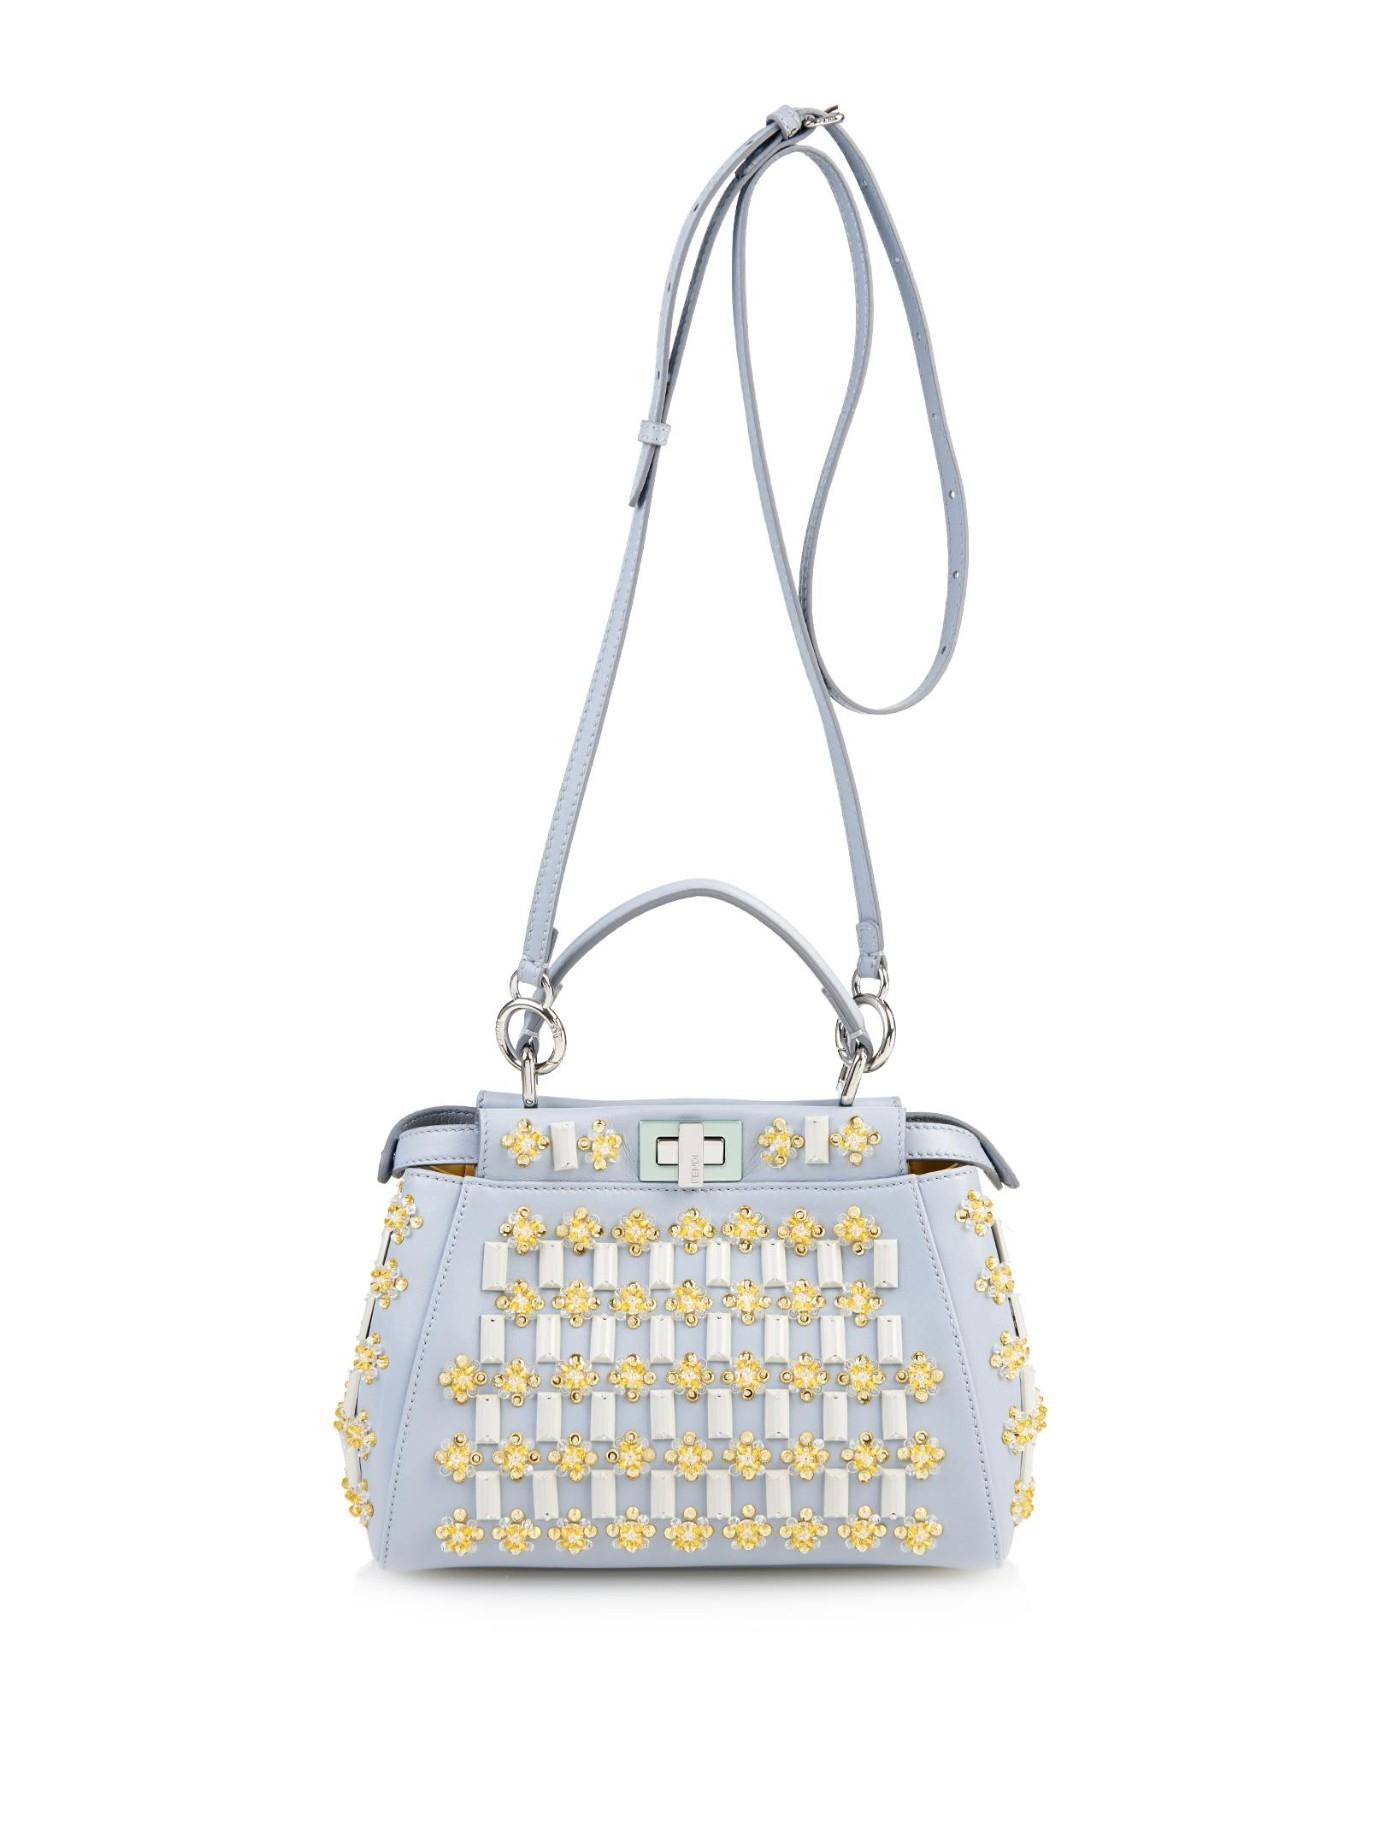 Fendi Mini Peekaboo Floral-Embellishments Cross-Body Bag In Blue (BLUE MULTI) | Lyst